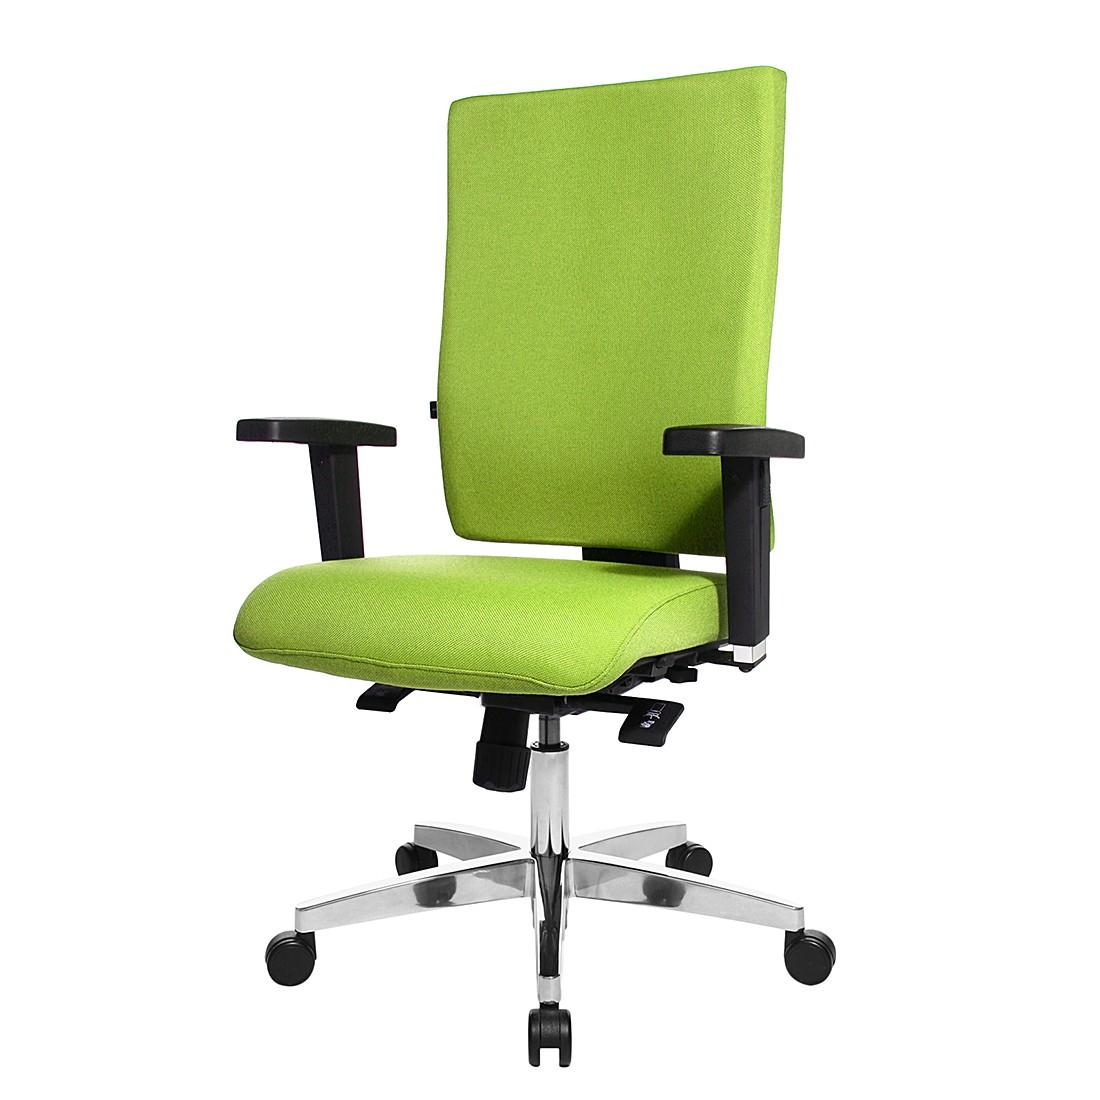 Bürodrehstuhl Lightstar 20 - Mit Armlehnen - Grün, Topstar